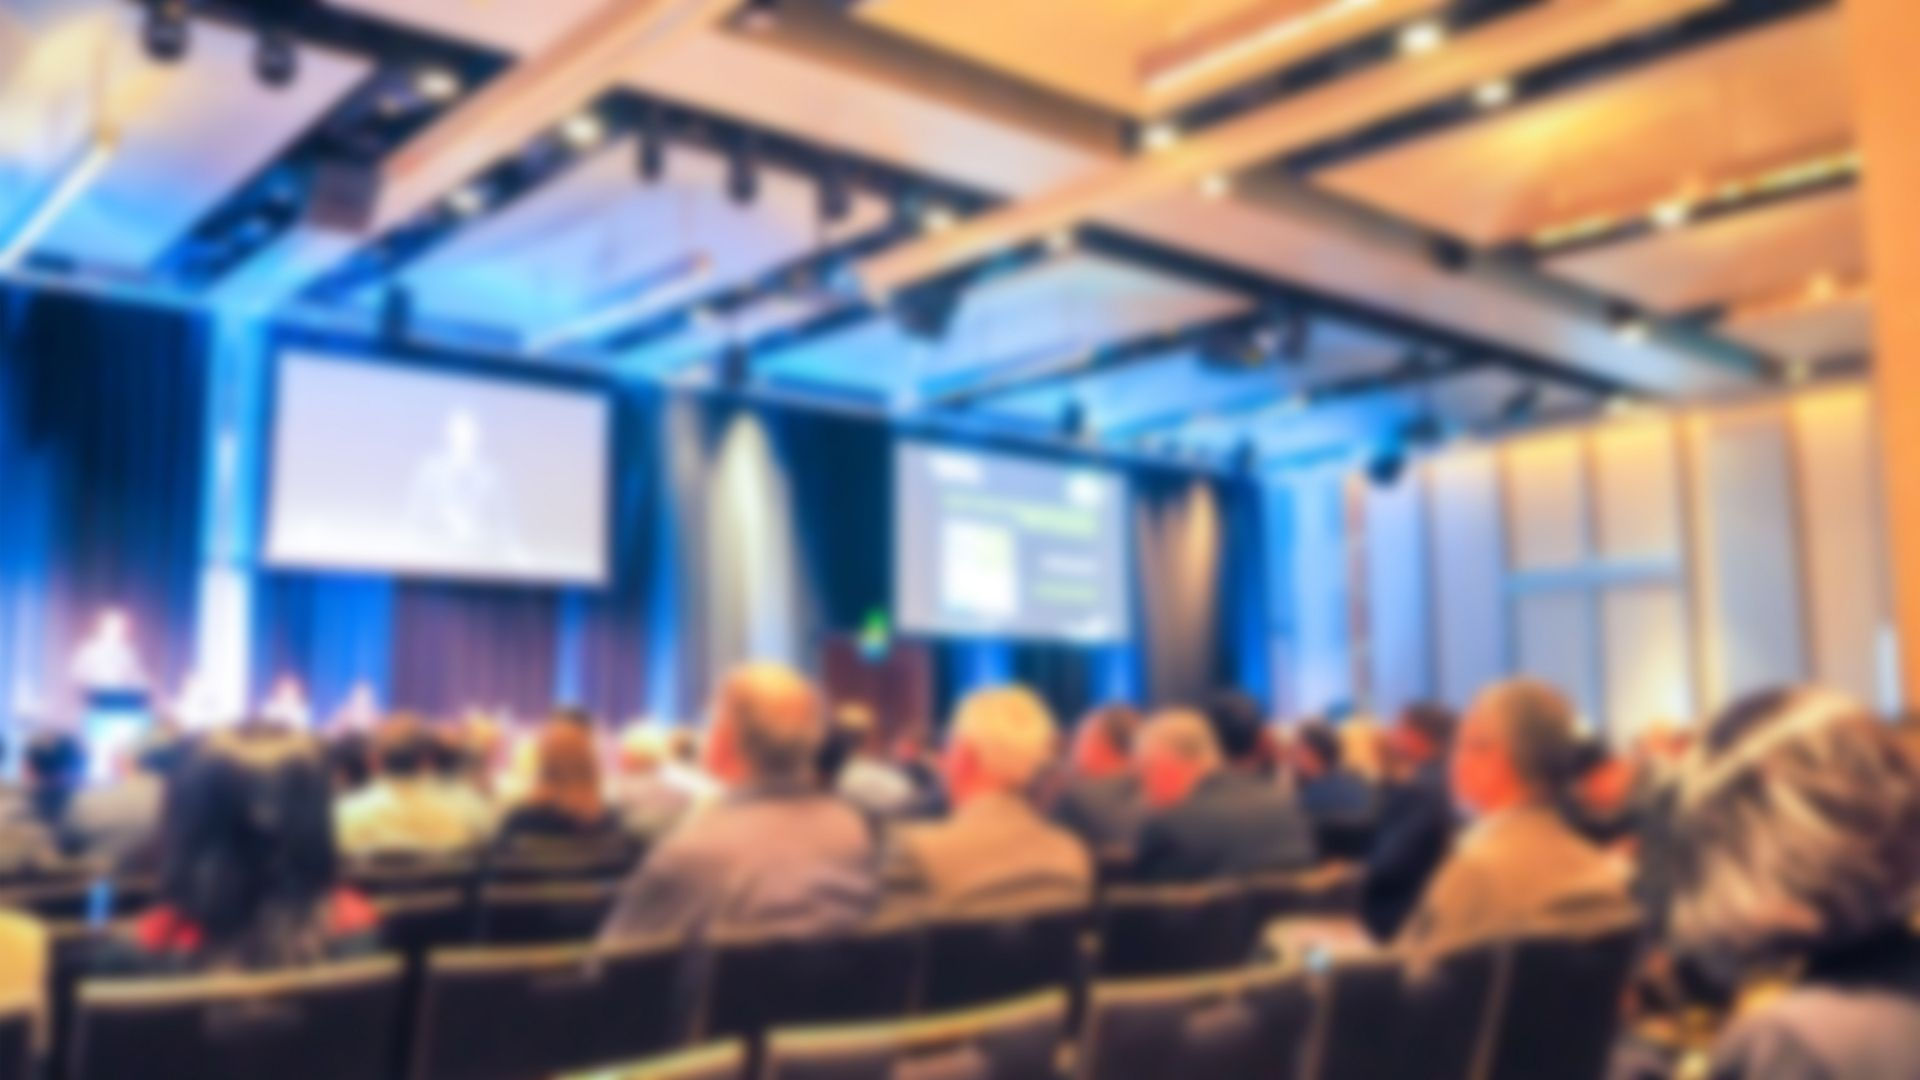 event, 2021, relaunch, international, hybrid event